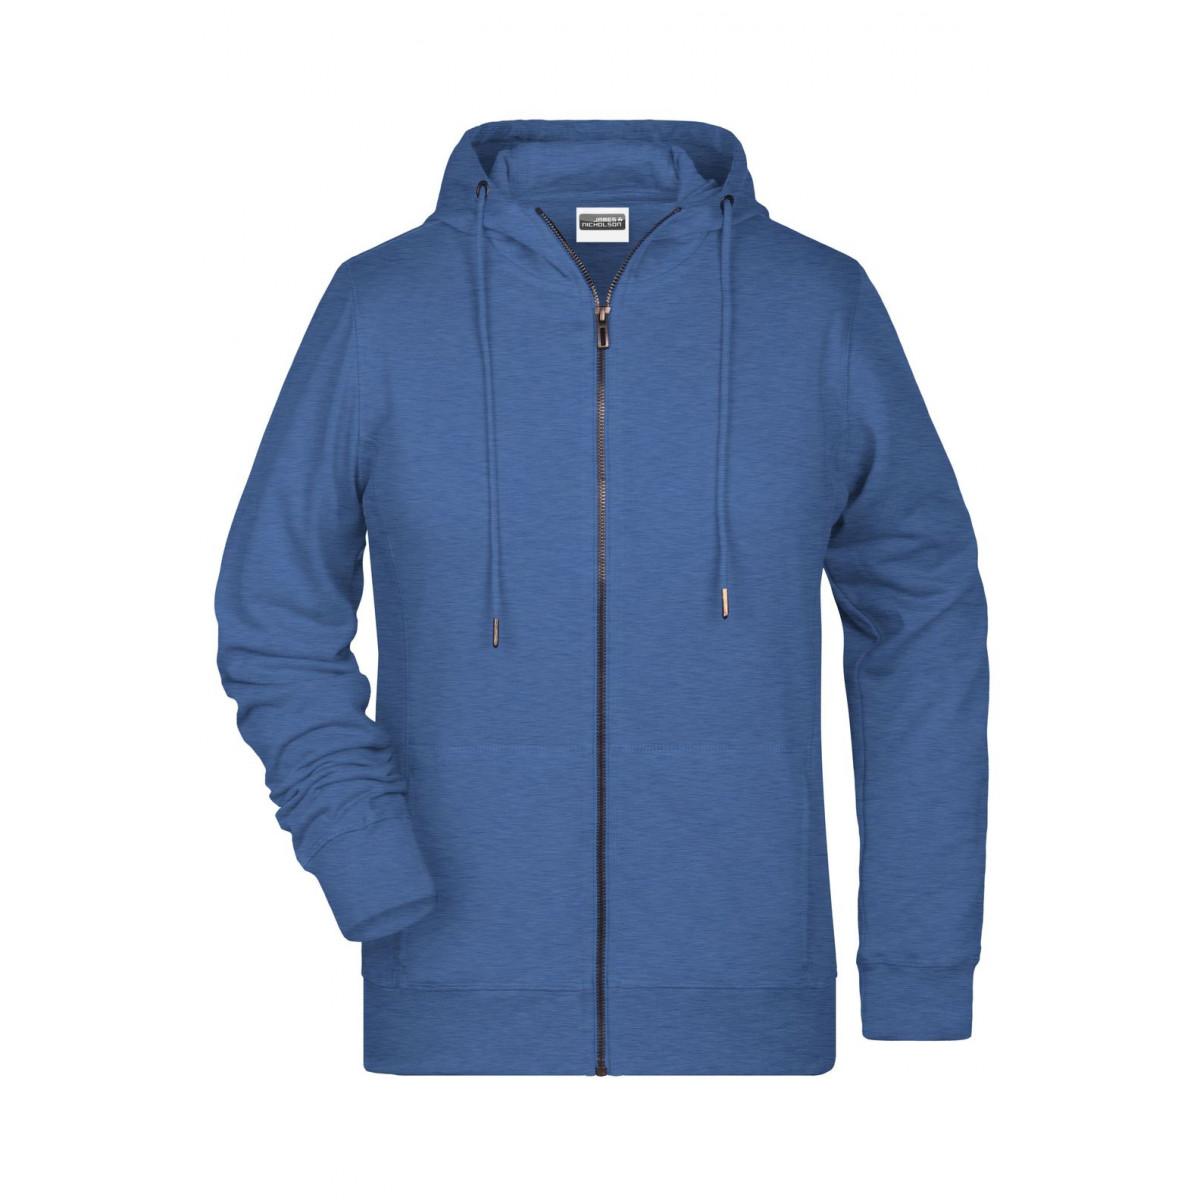 Толстовка женская 8025 Ladies Zip Hoody - Светло-синий меланж